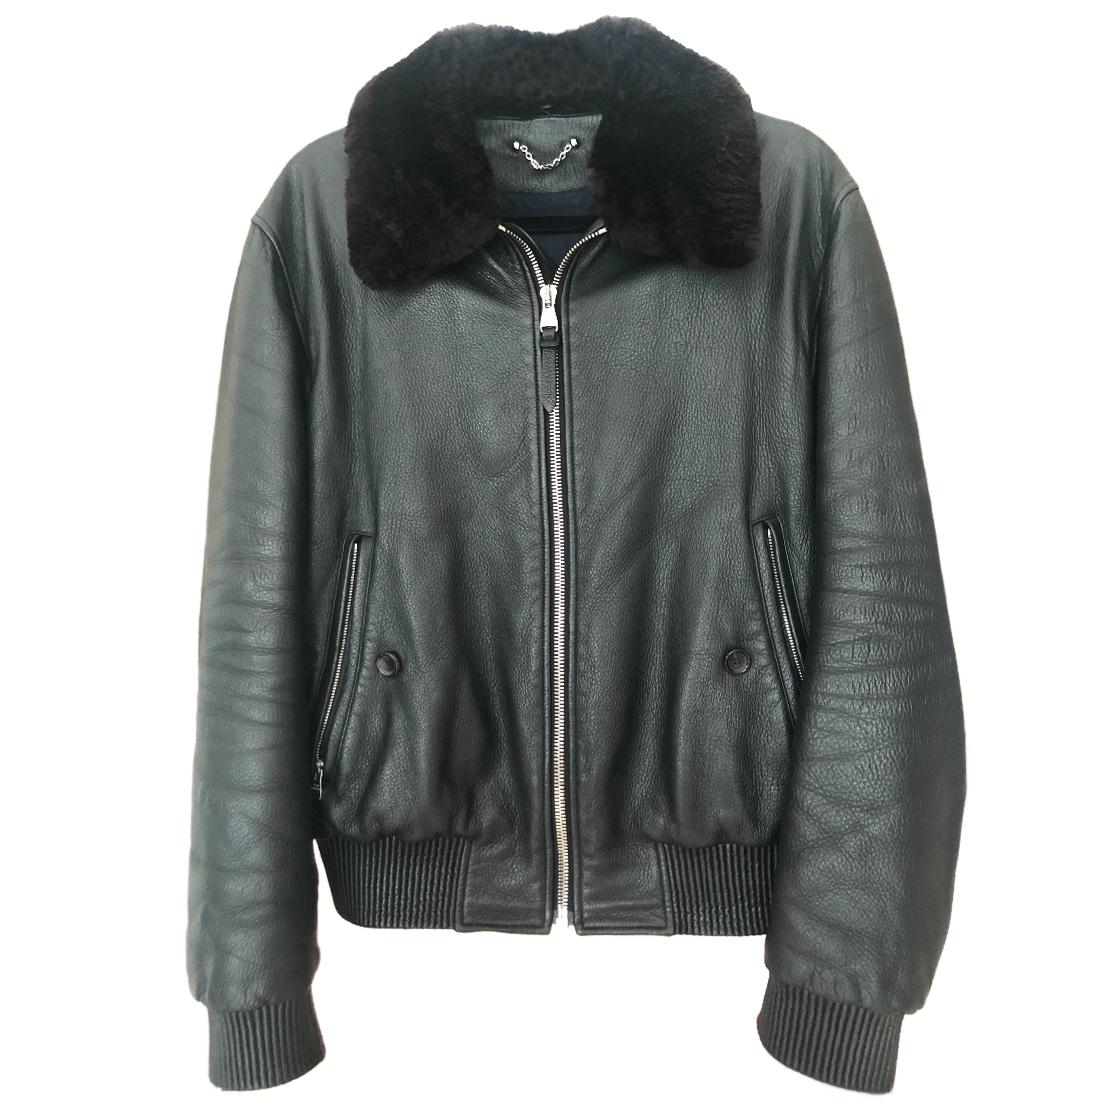 75f7d477 Louis Vuitton men's black leather jacket with removable fur collar